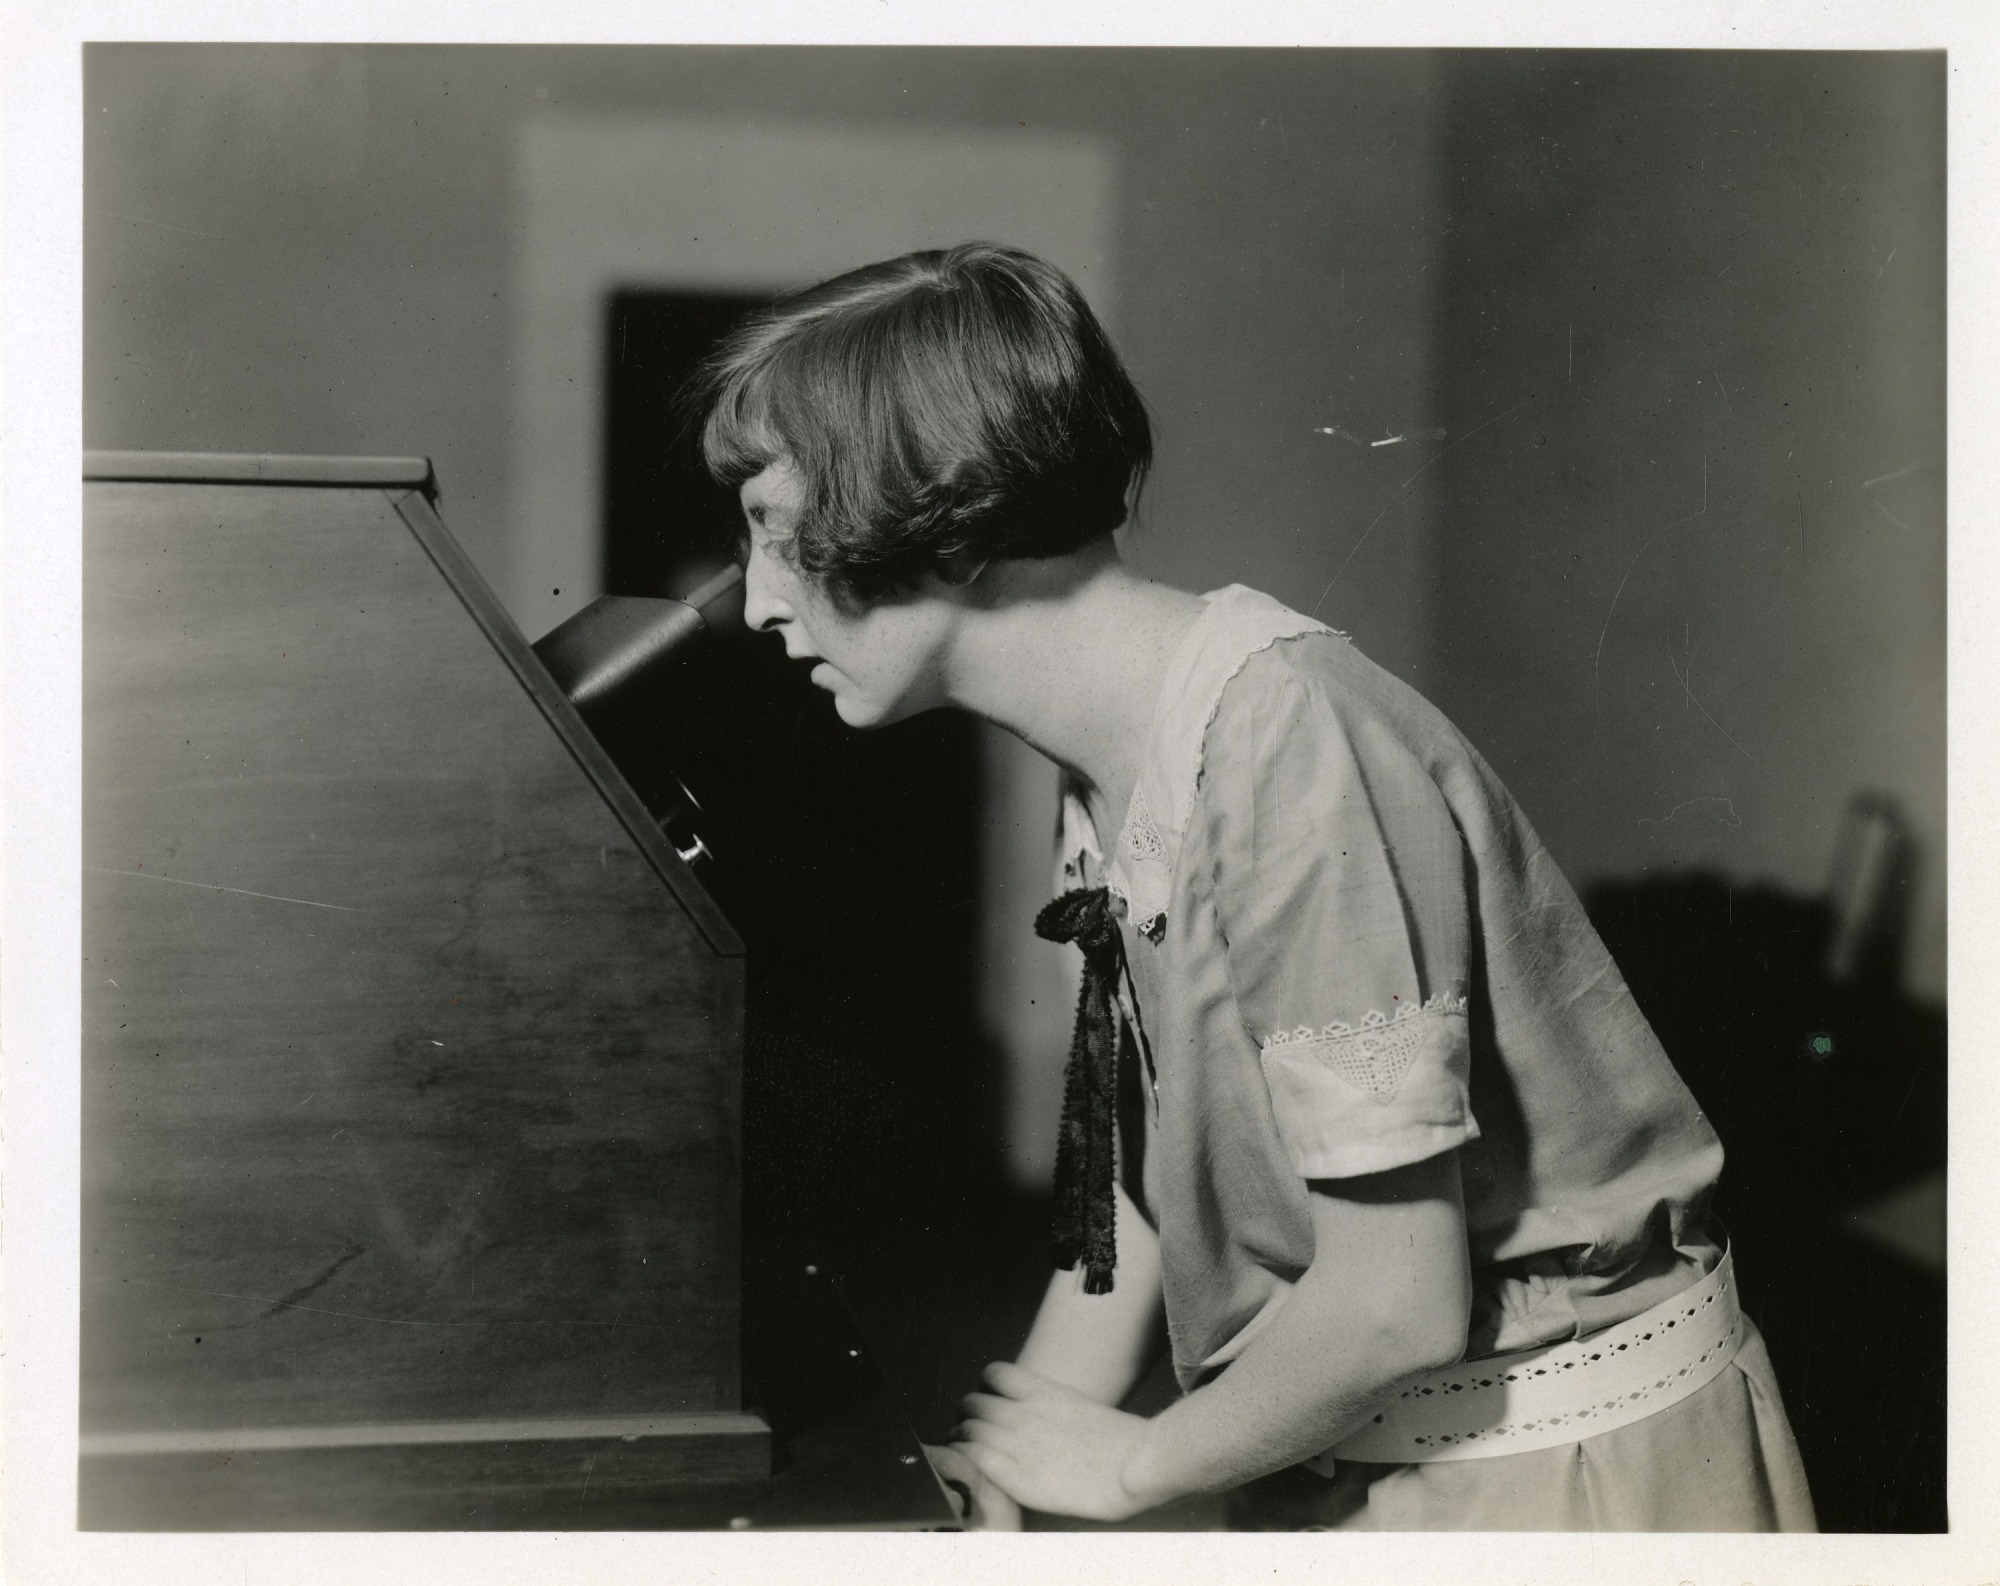 Miss McGrath, Smithsonian Institution Archives, SIA Acc. 90-105 [SIA2008-5685].